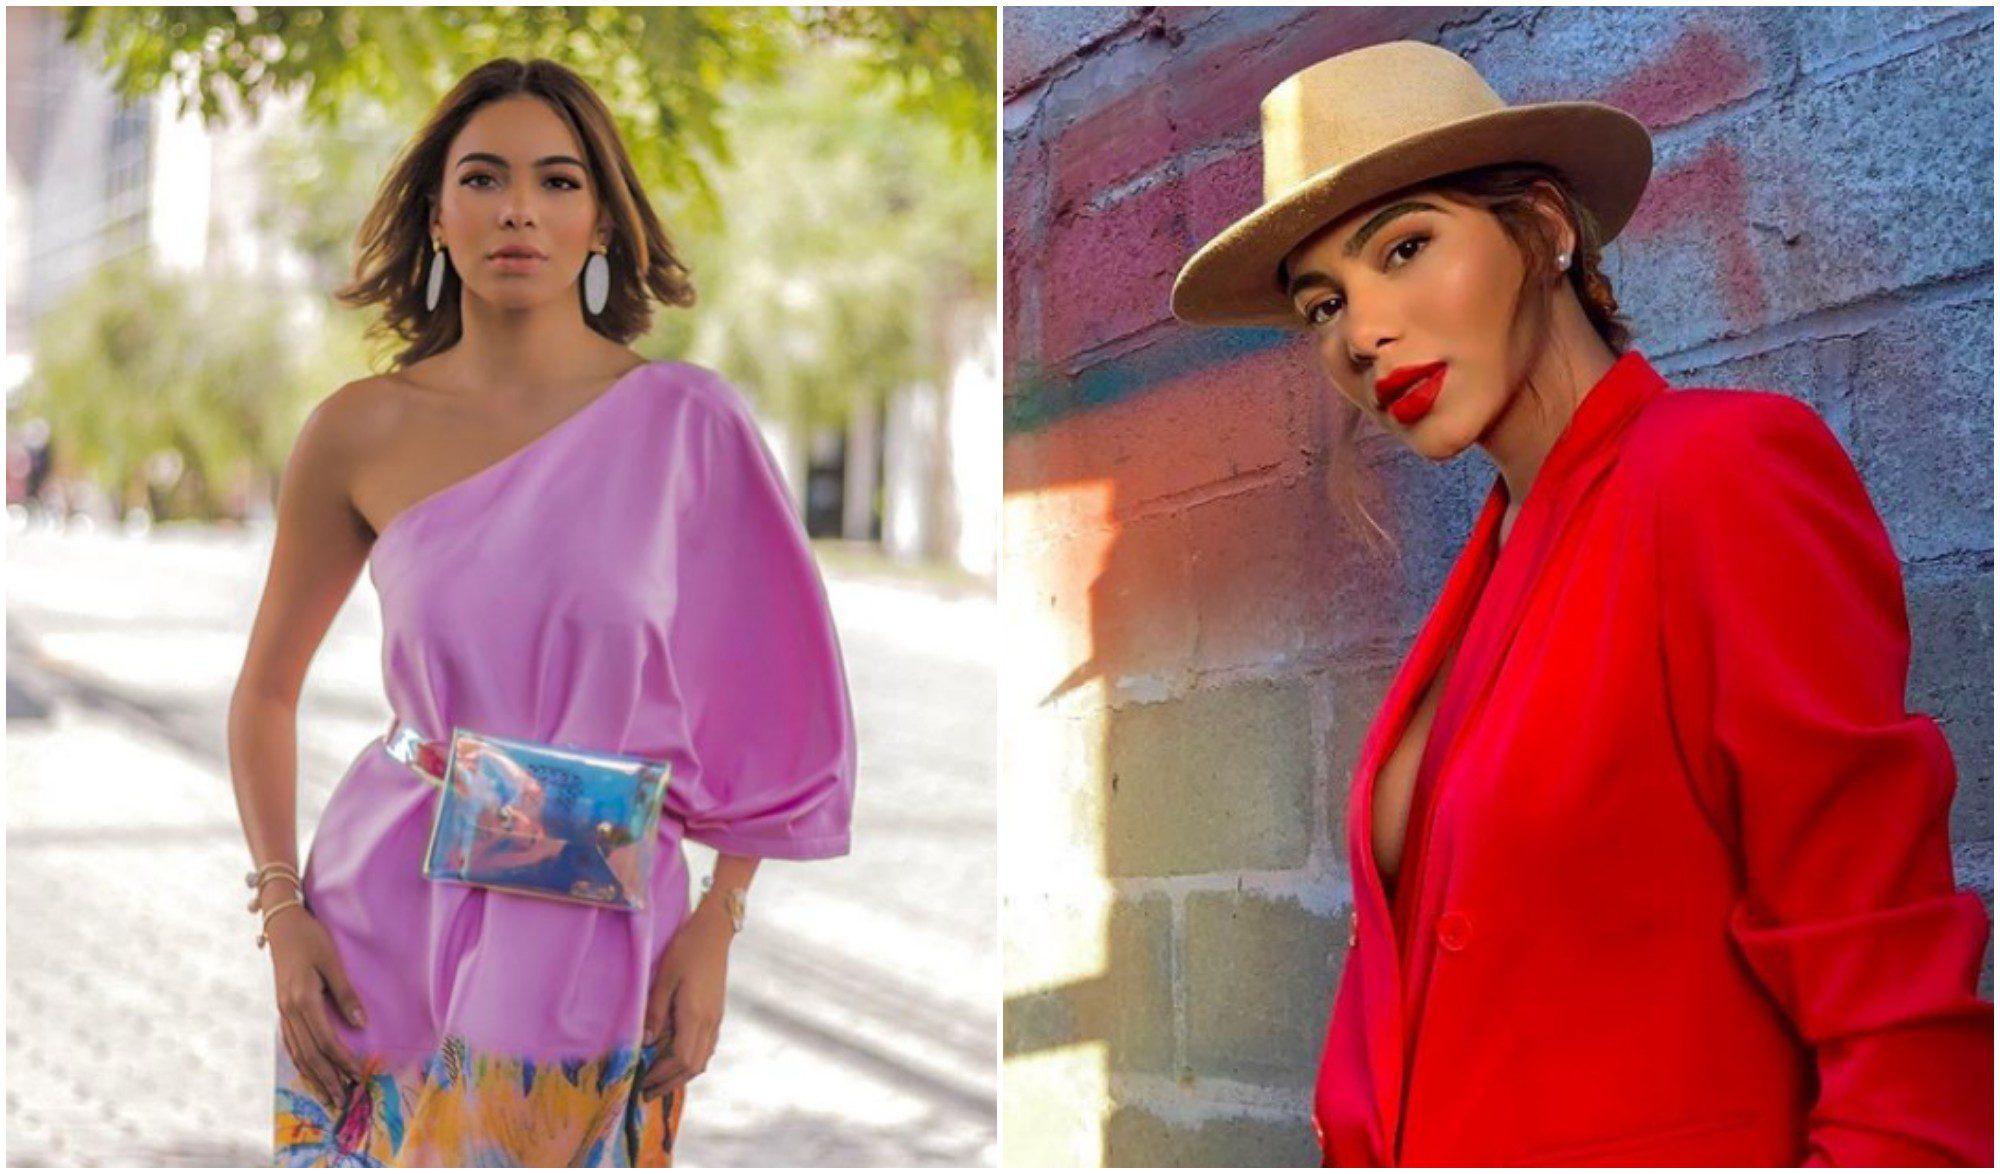 Hondureña Woldie Durón destaca en Miss Honduras Universo